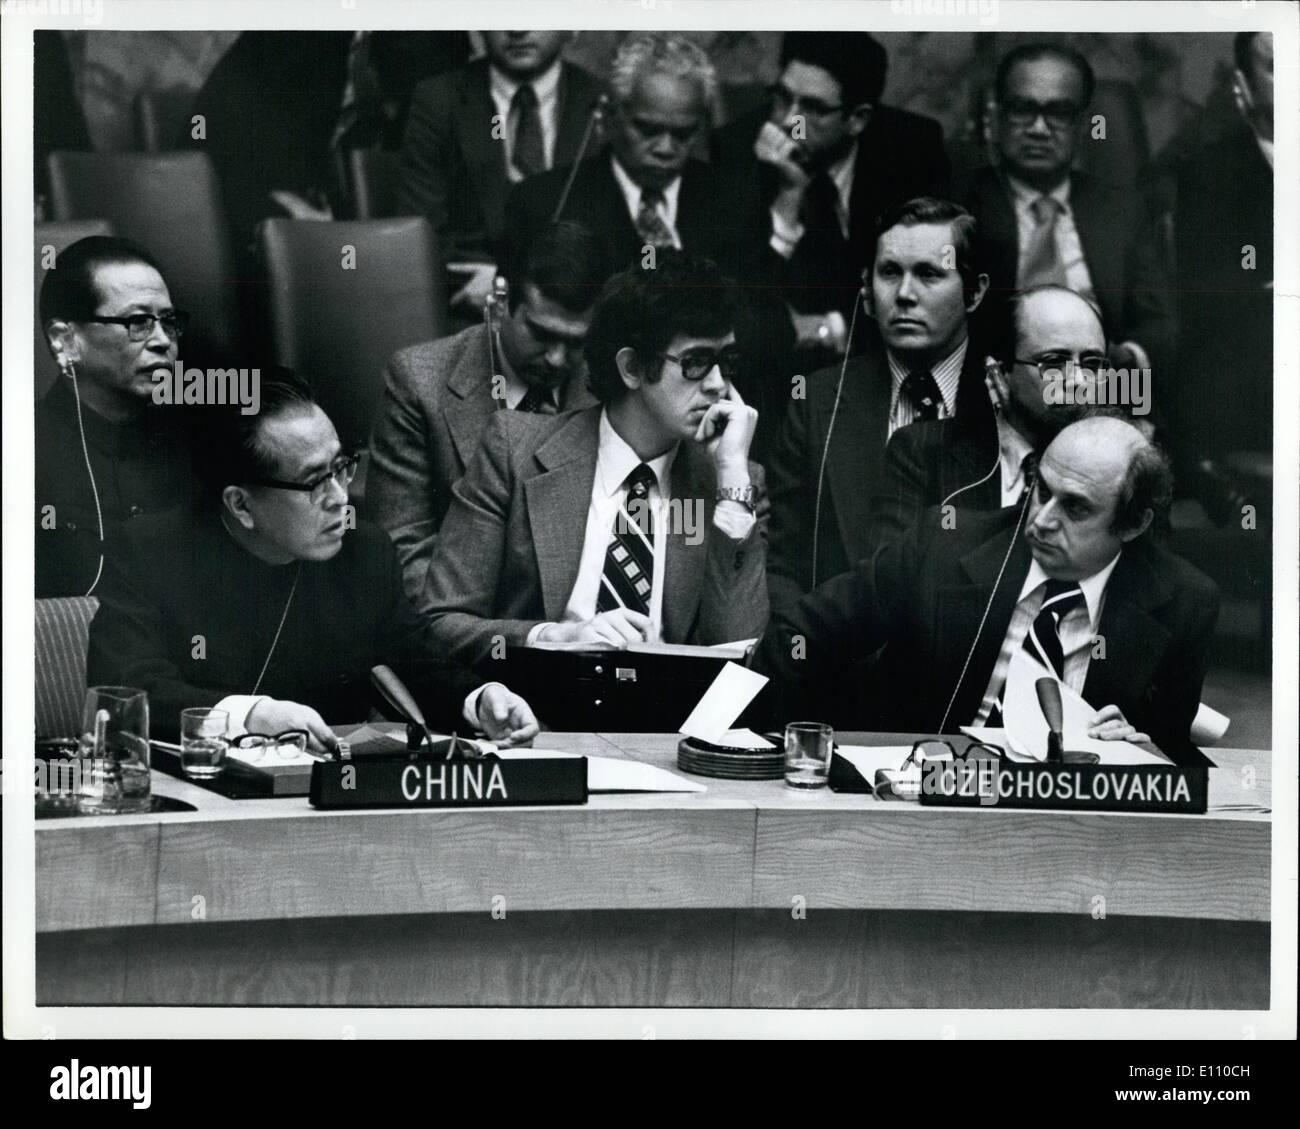 02 février 1975 - ~~~~ Chen Chu sec de l'ONU. Conseil Photo Stock